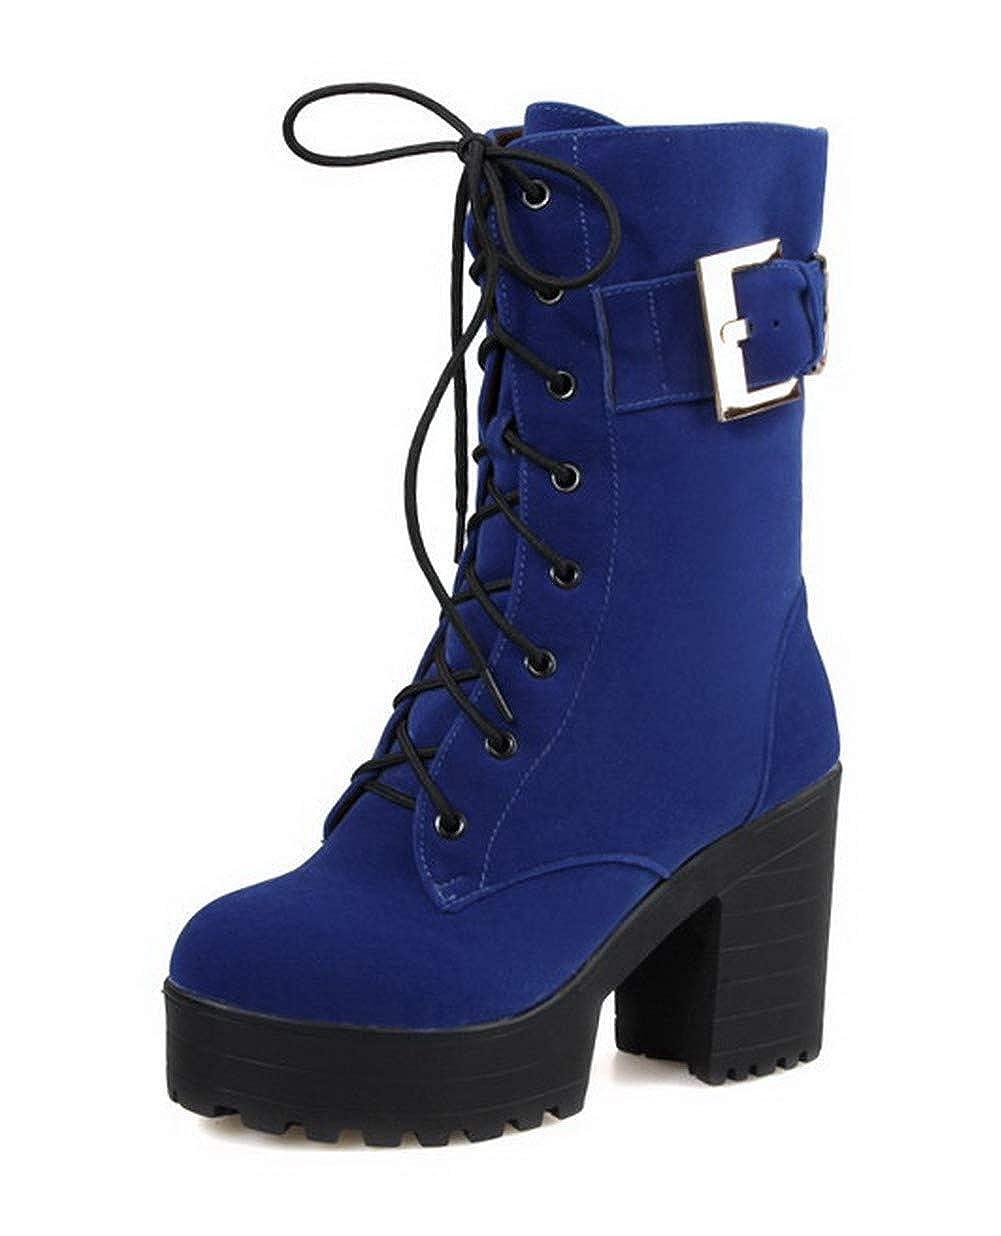 AalarDom Womens Low-Top Zipper Imitated Suede High-Heels Round-Toe Boots TSDXG038403